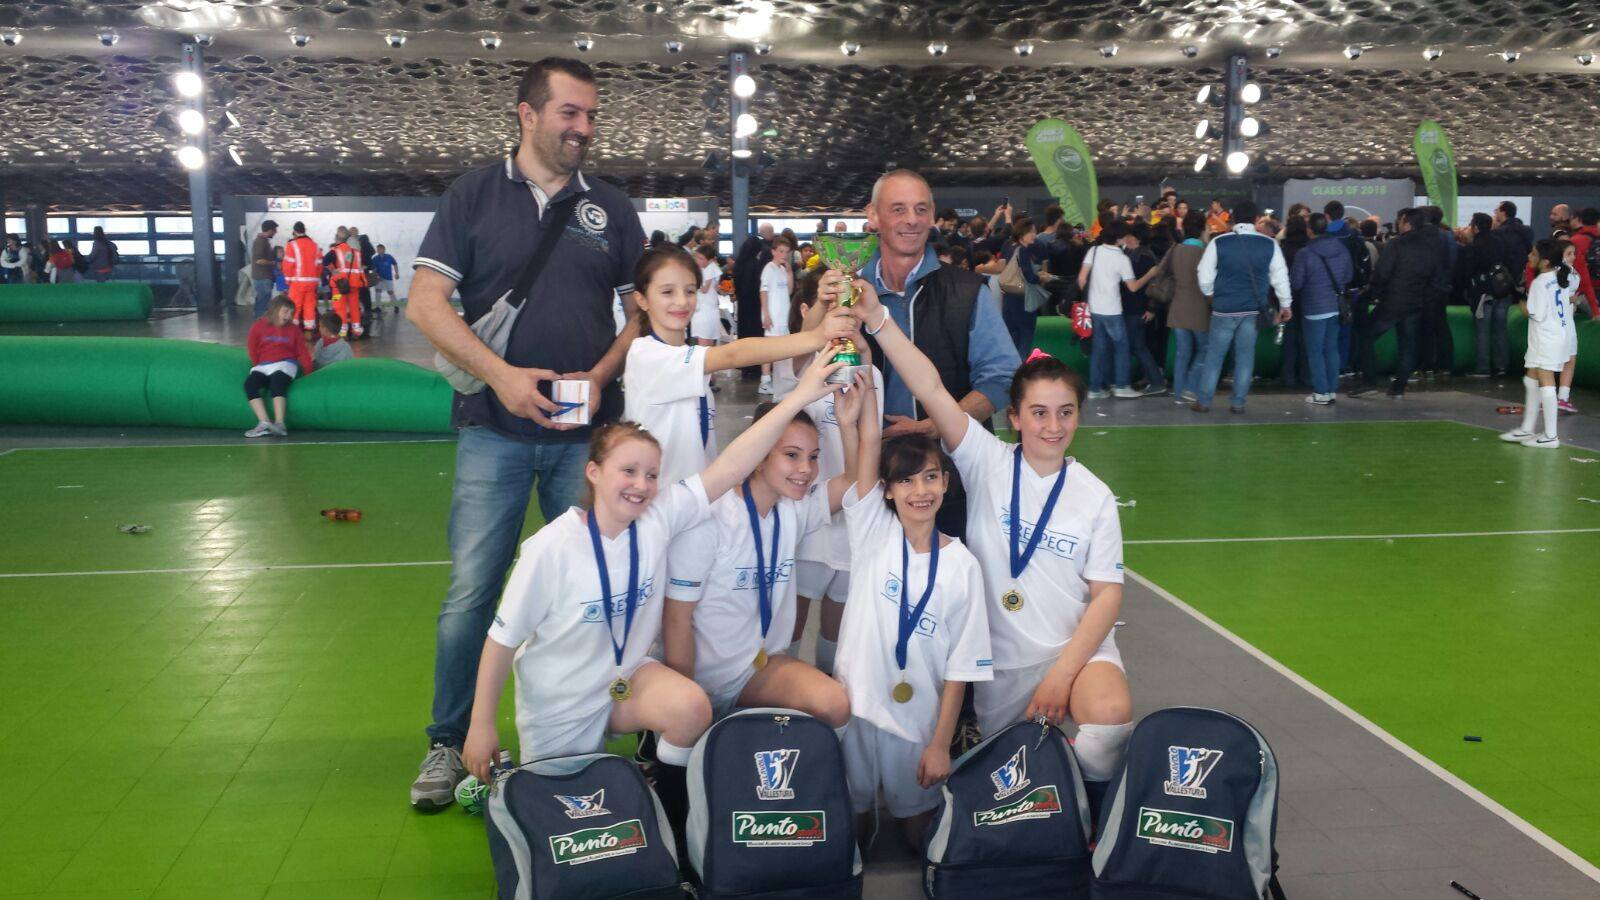 Vittoria al Torneo Ravano 2016!!!